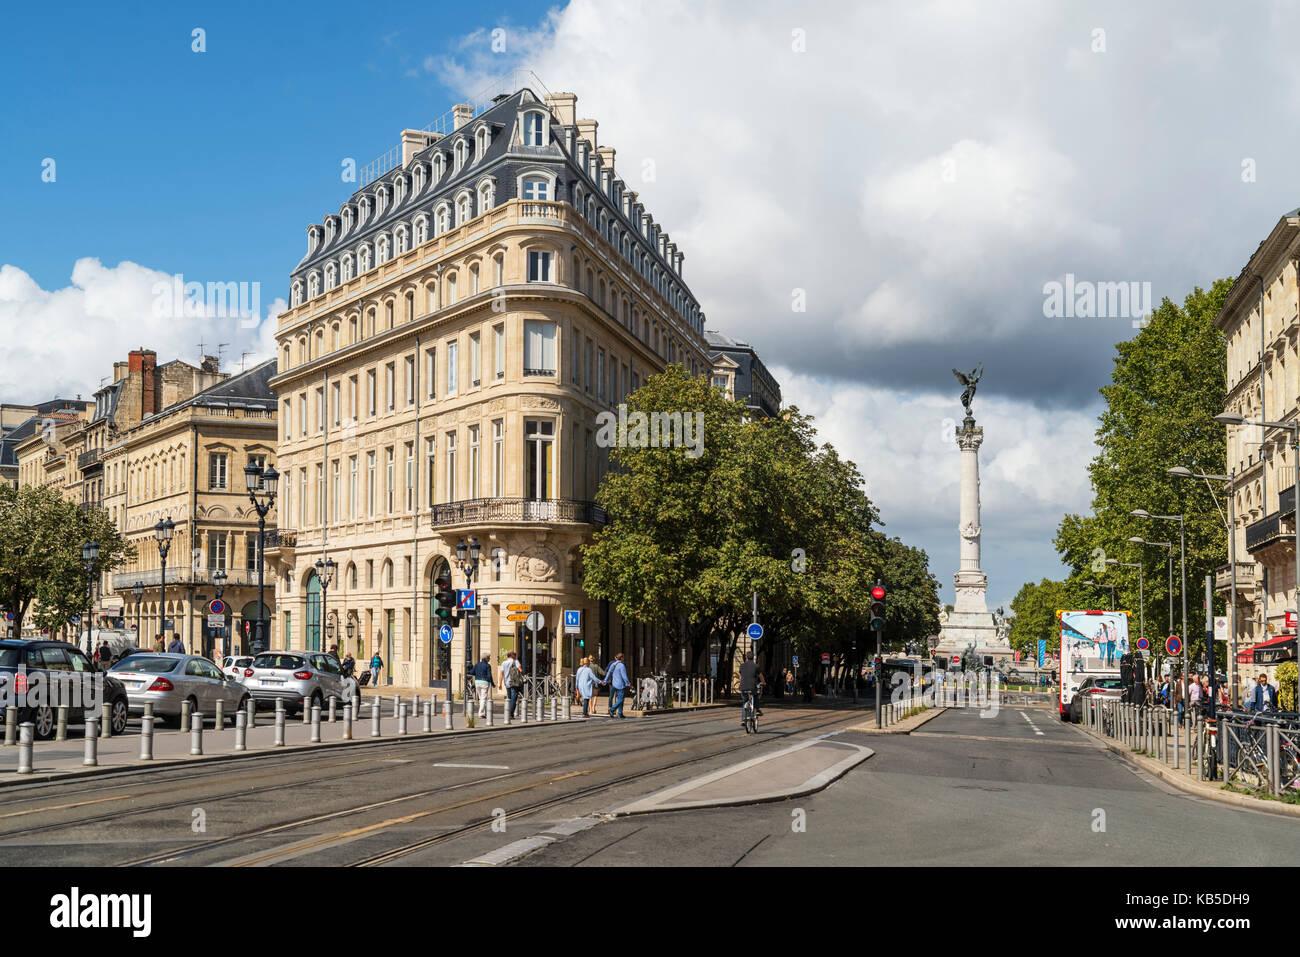 View from Place de la Comedie to Monument aux Girondins, , Bordeaux, France - Stock Image